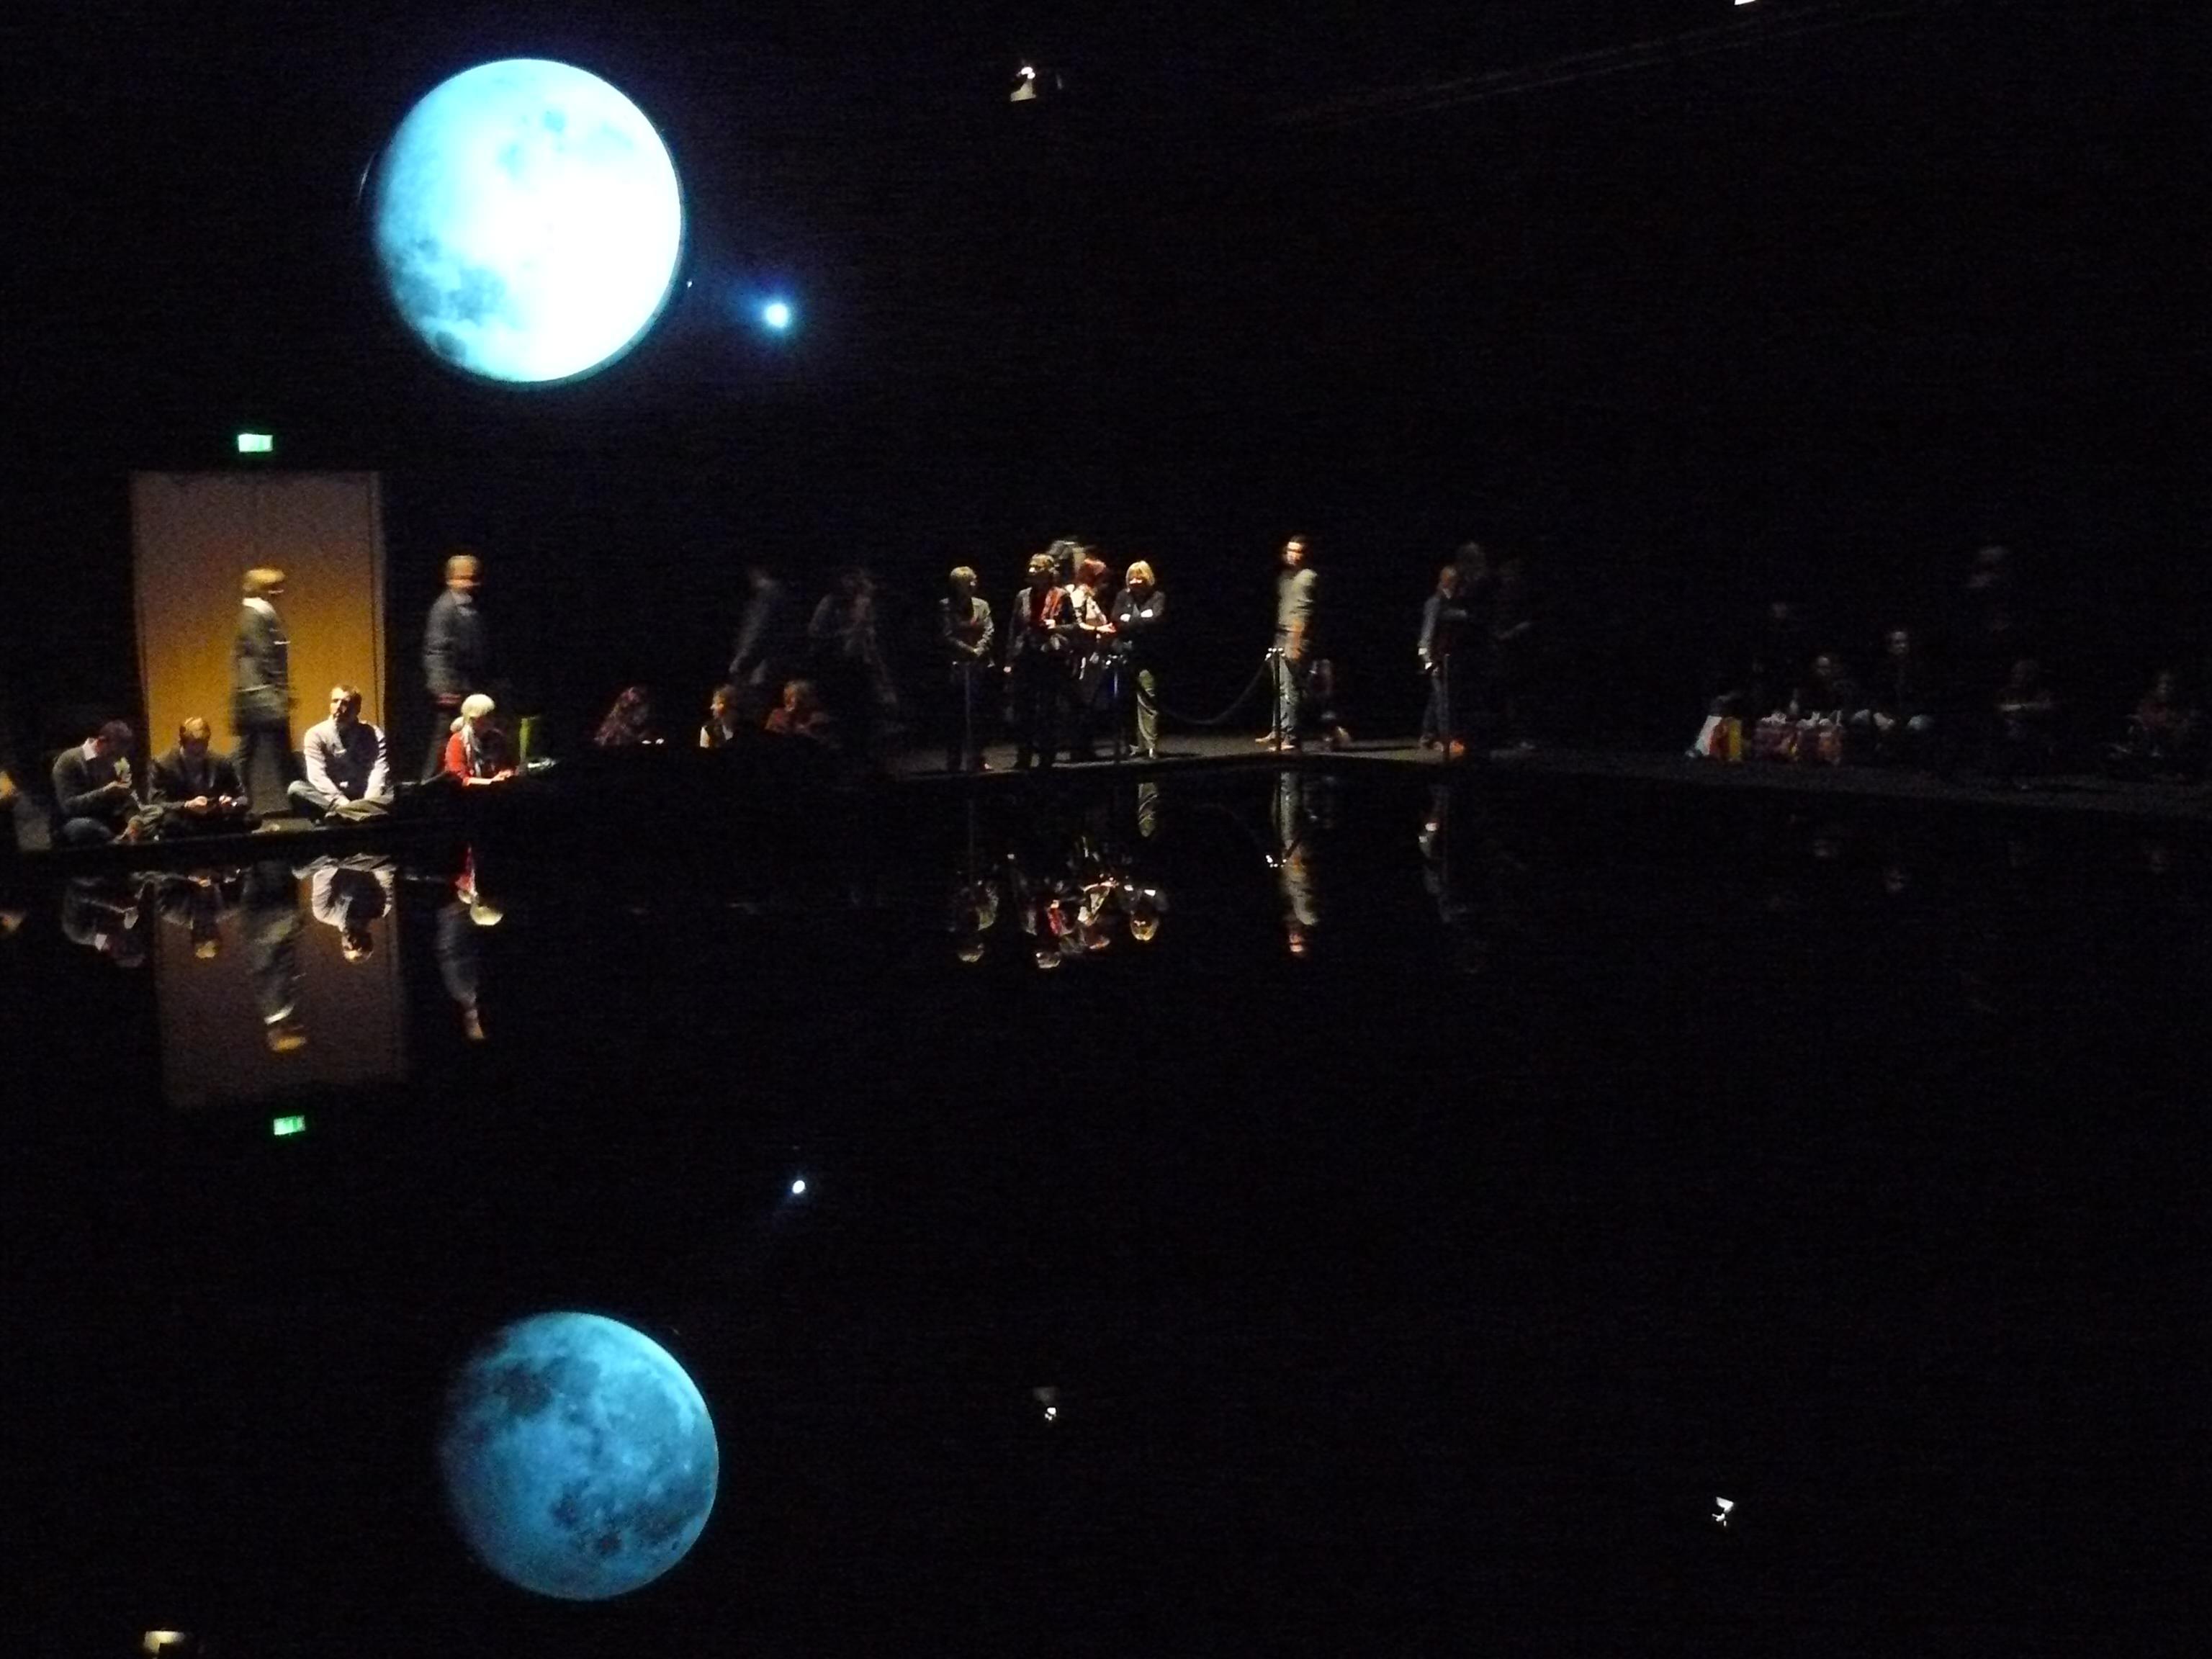 »Dunkel war's, der Mond schien helle« (Neuseeland-Pavillon)